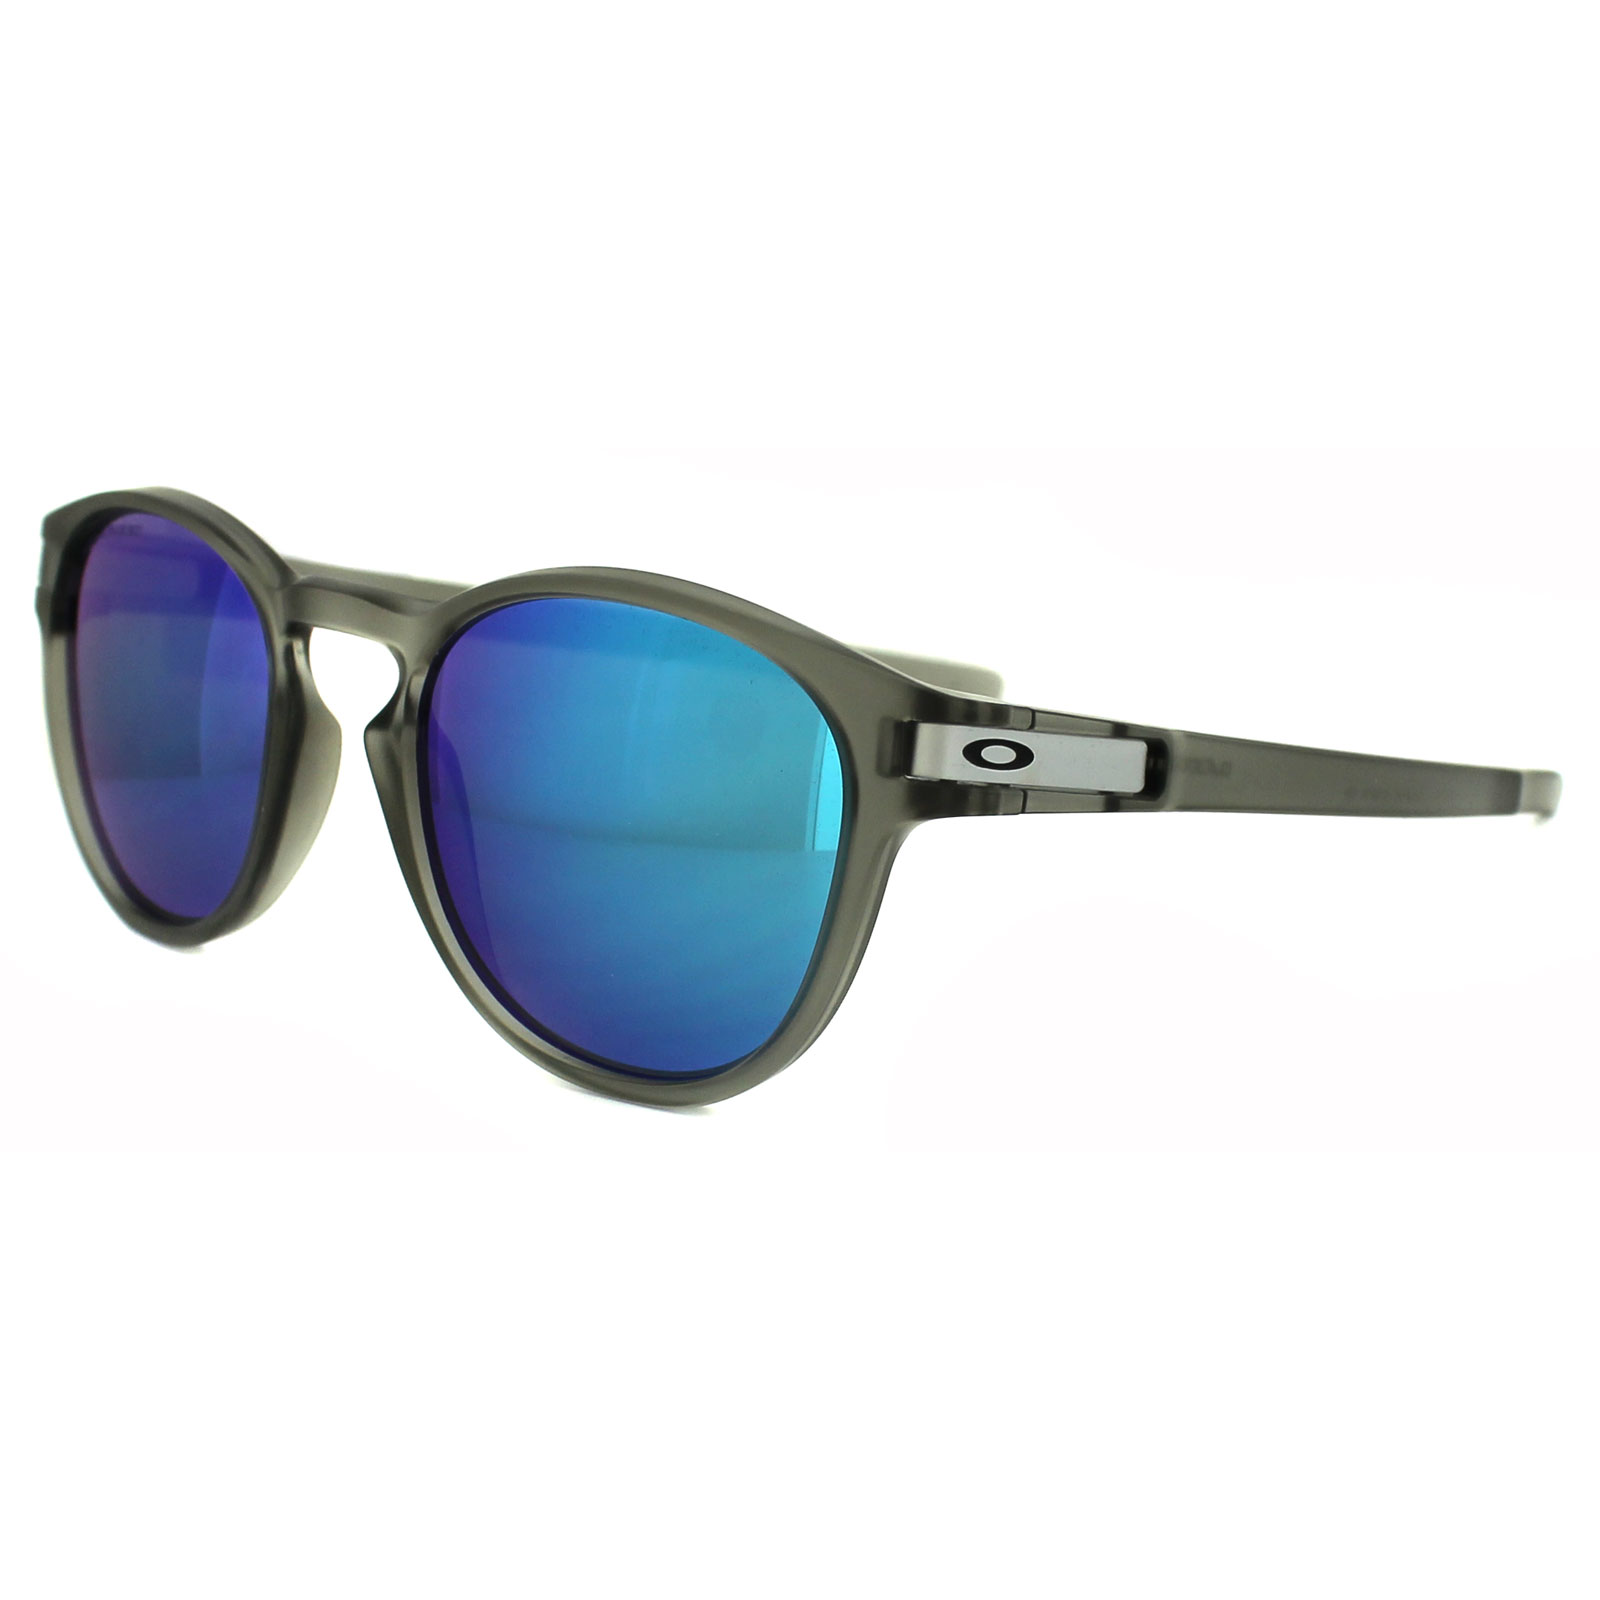 Oakley Sunglasses Goggles amp Apparel for Men and Women